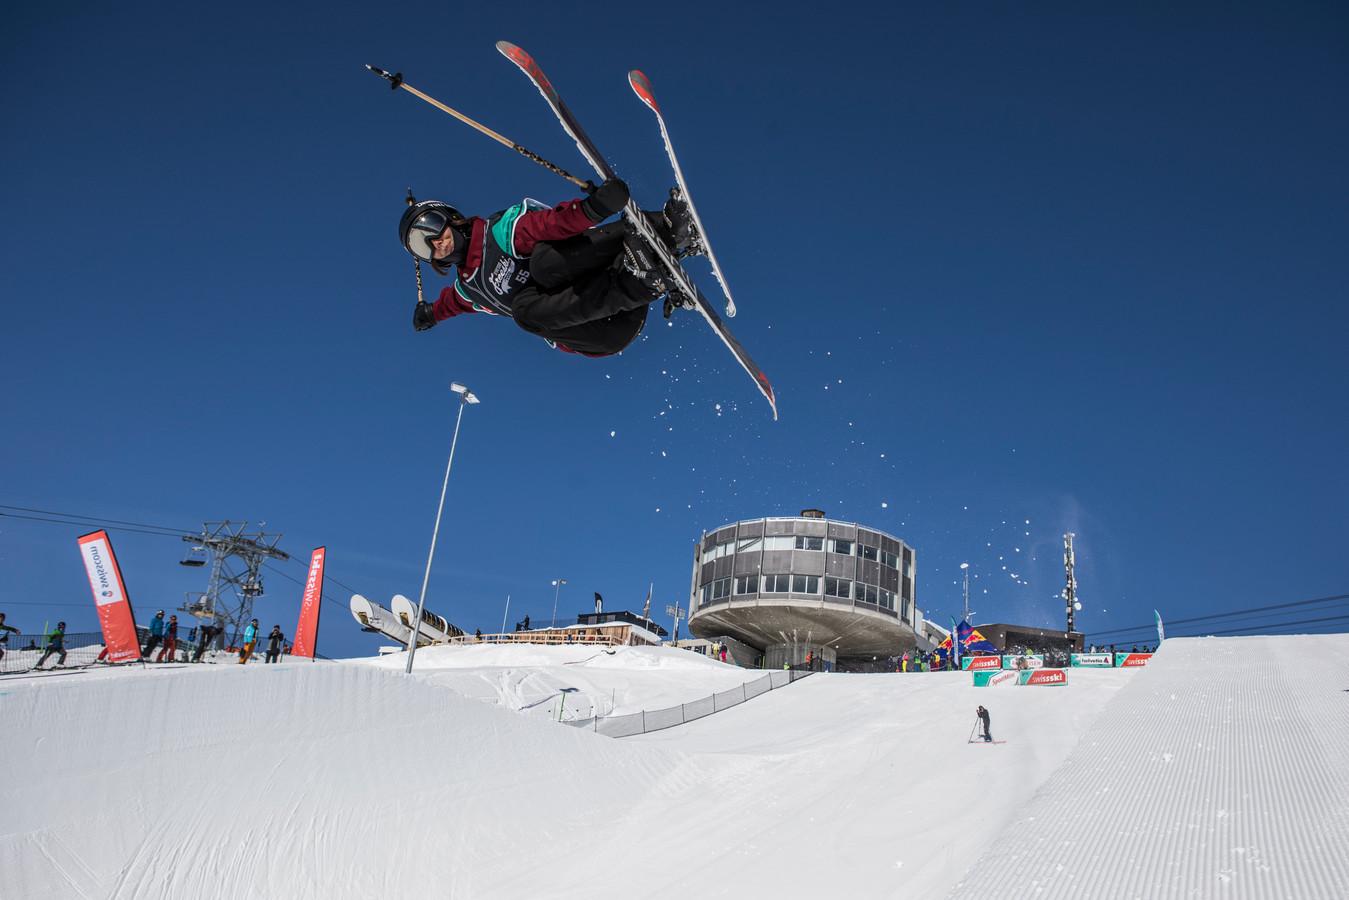 Freestyle-skiër Isabelle Hanssen uit Nijmegen.